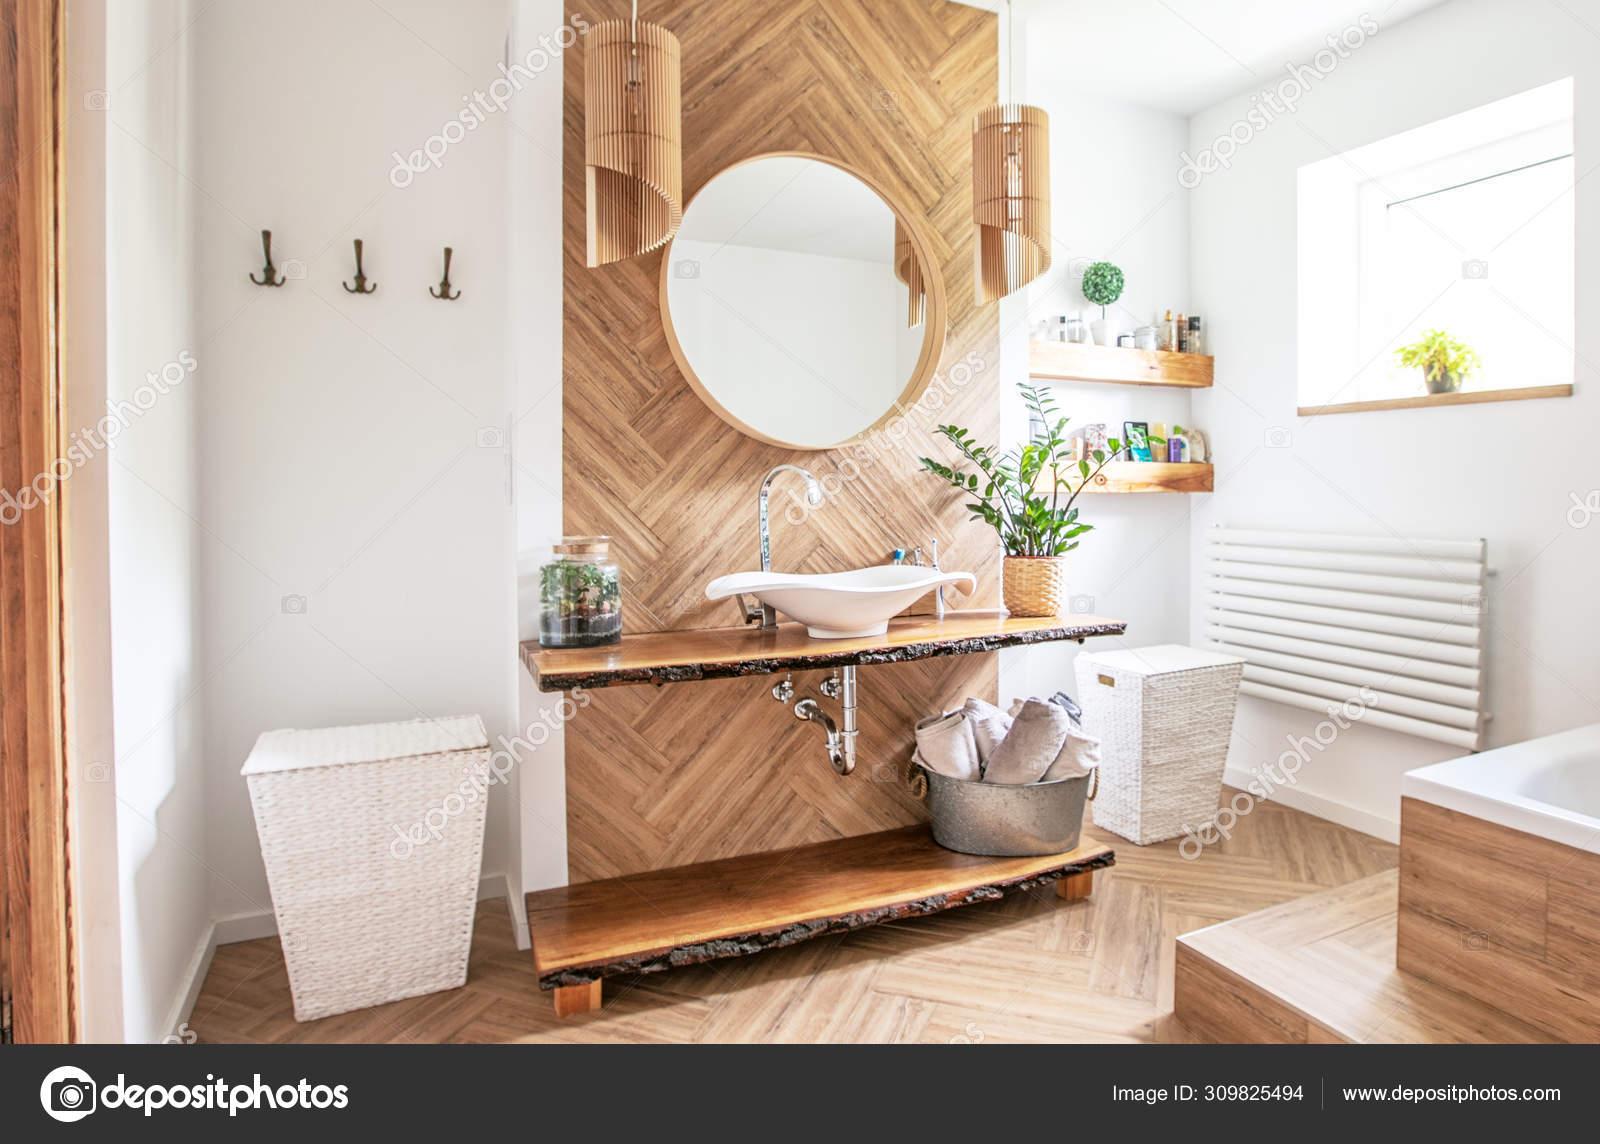 Boho style bathroom interior. Stock Photo by ©NeonShot 20